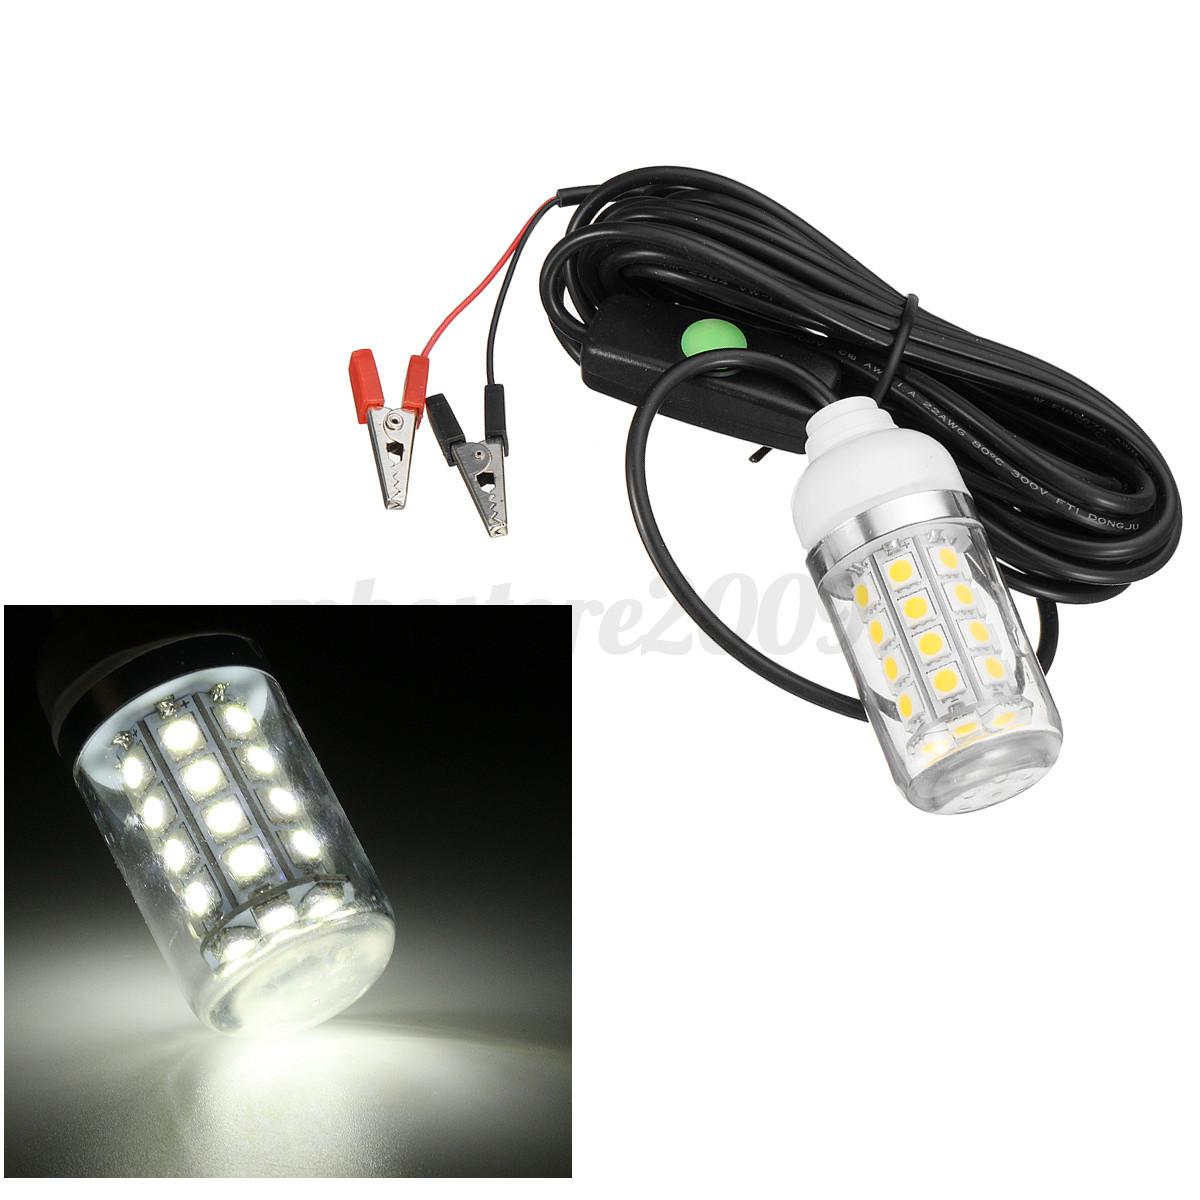 12v Fishing Lights, 12v Fishing Lights Suppliers and ...